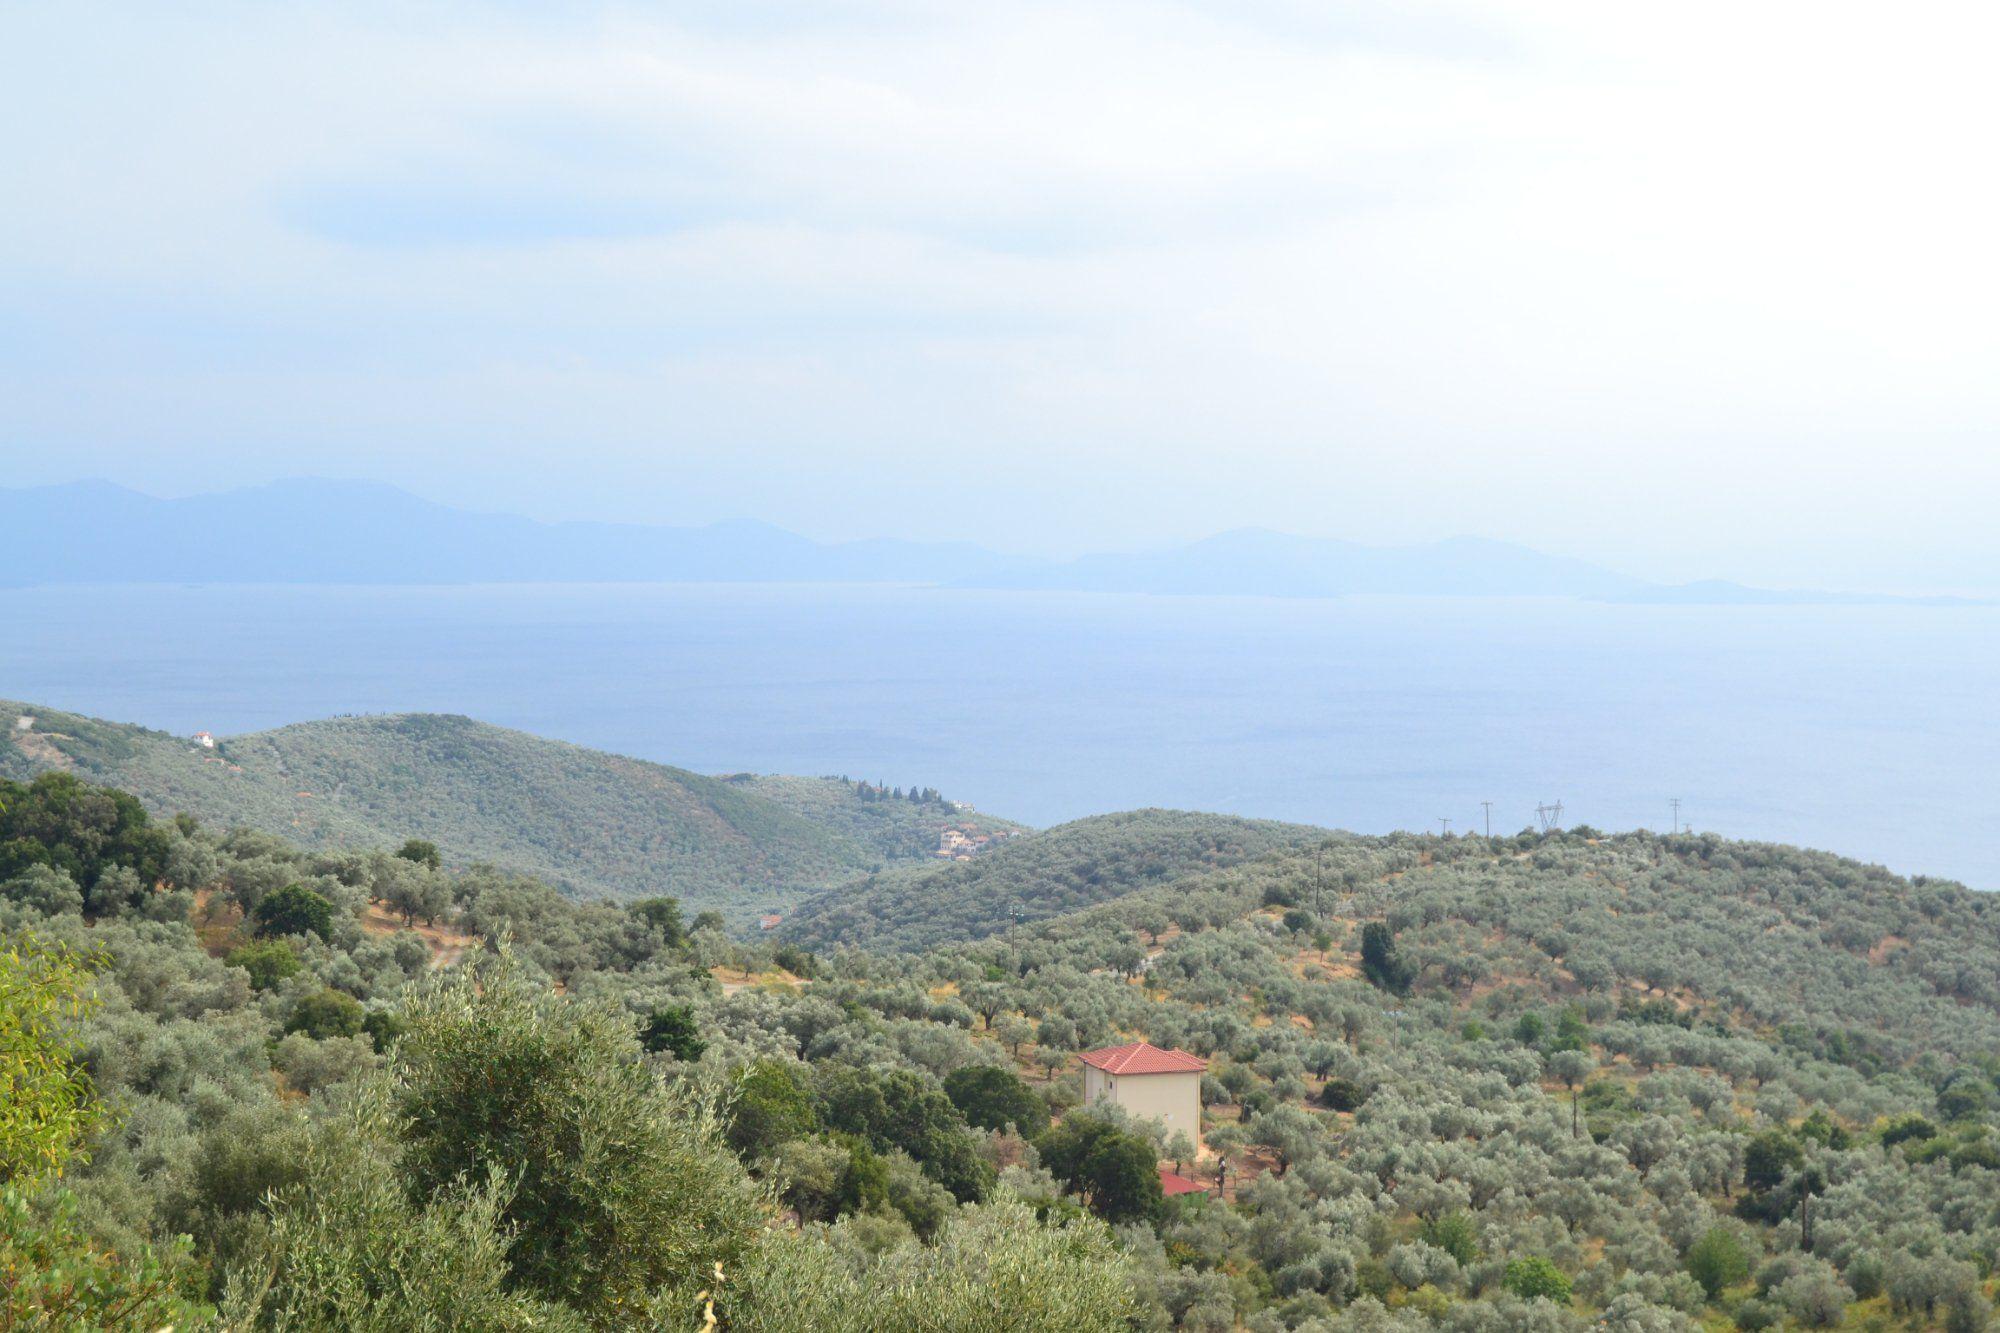 Tsagarada is the most wonderful destination in Pelion. - Mount Pelion, Thessaly Traveller Reviews - TripAdvisor